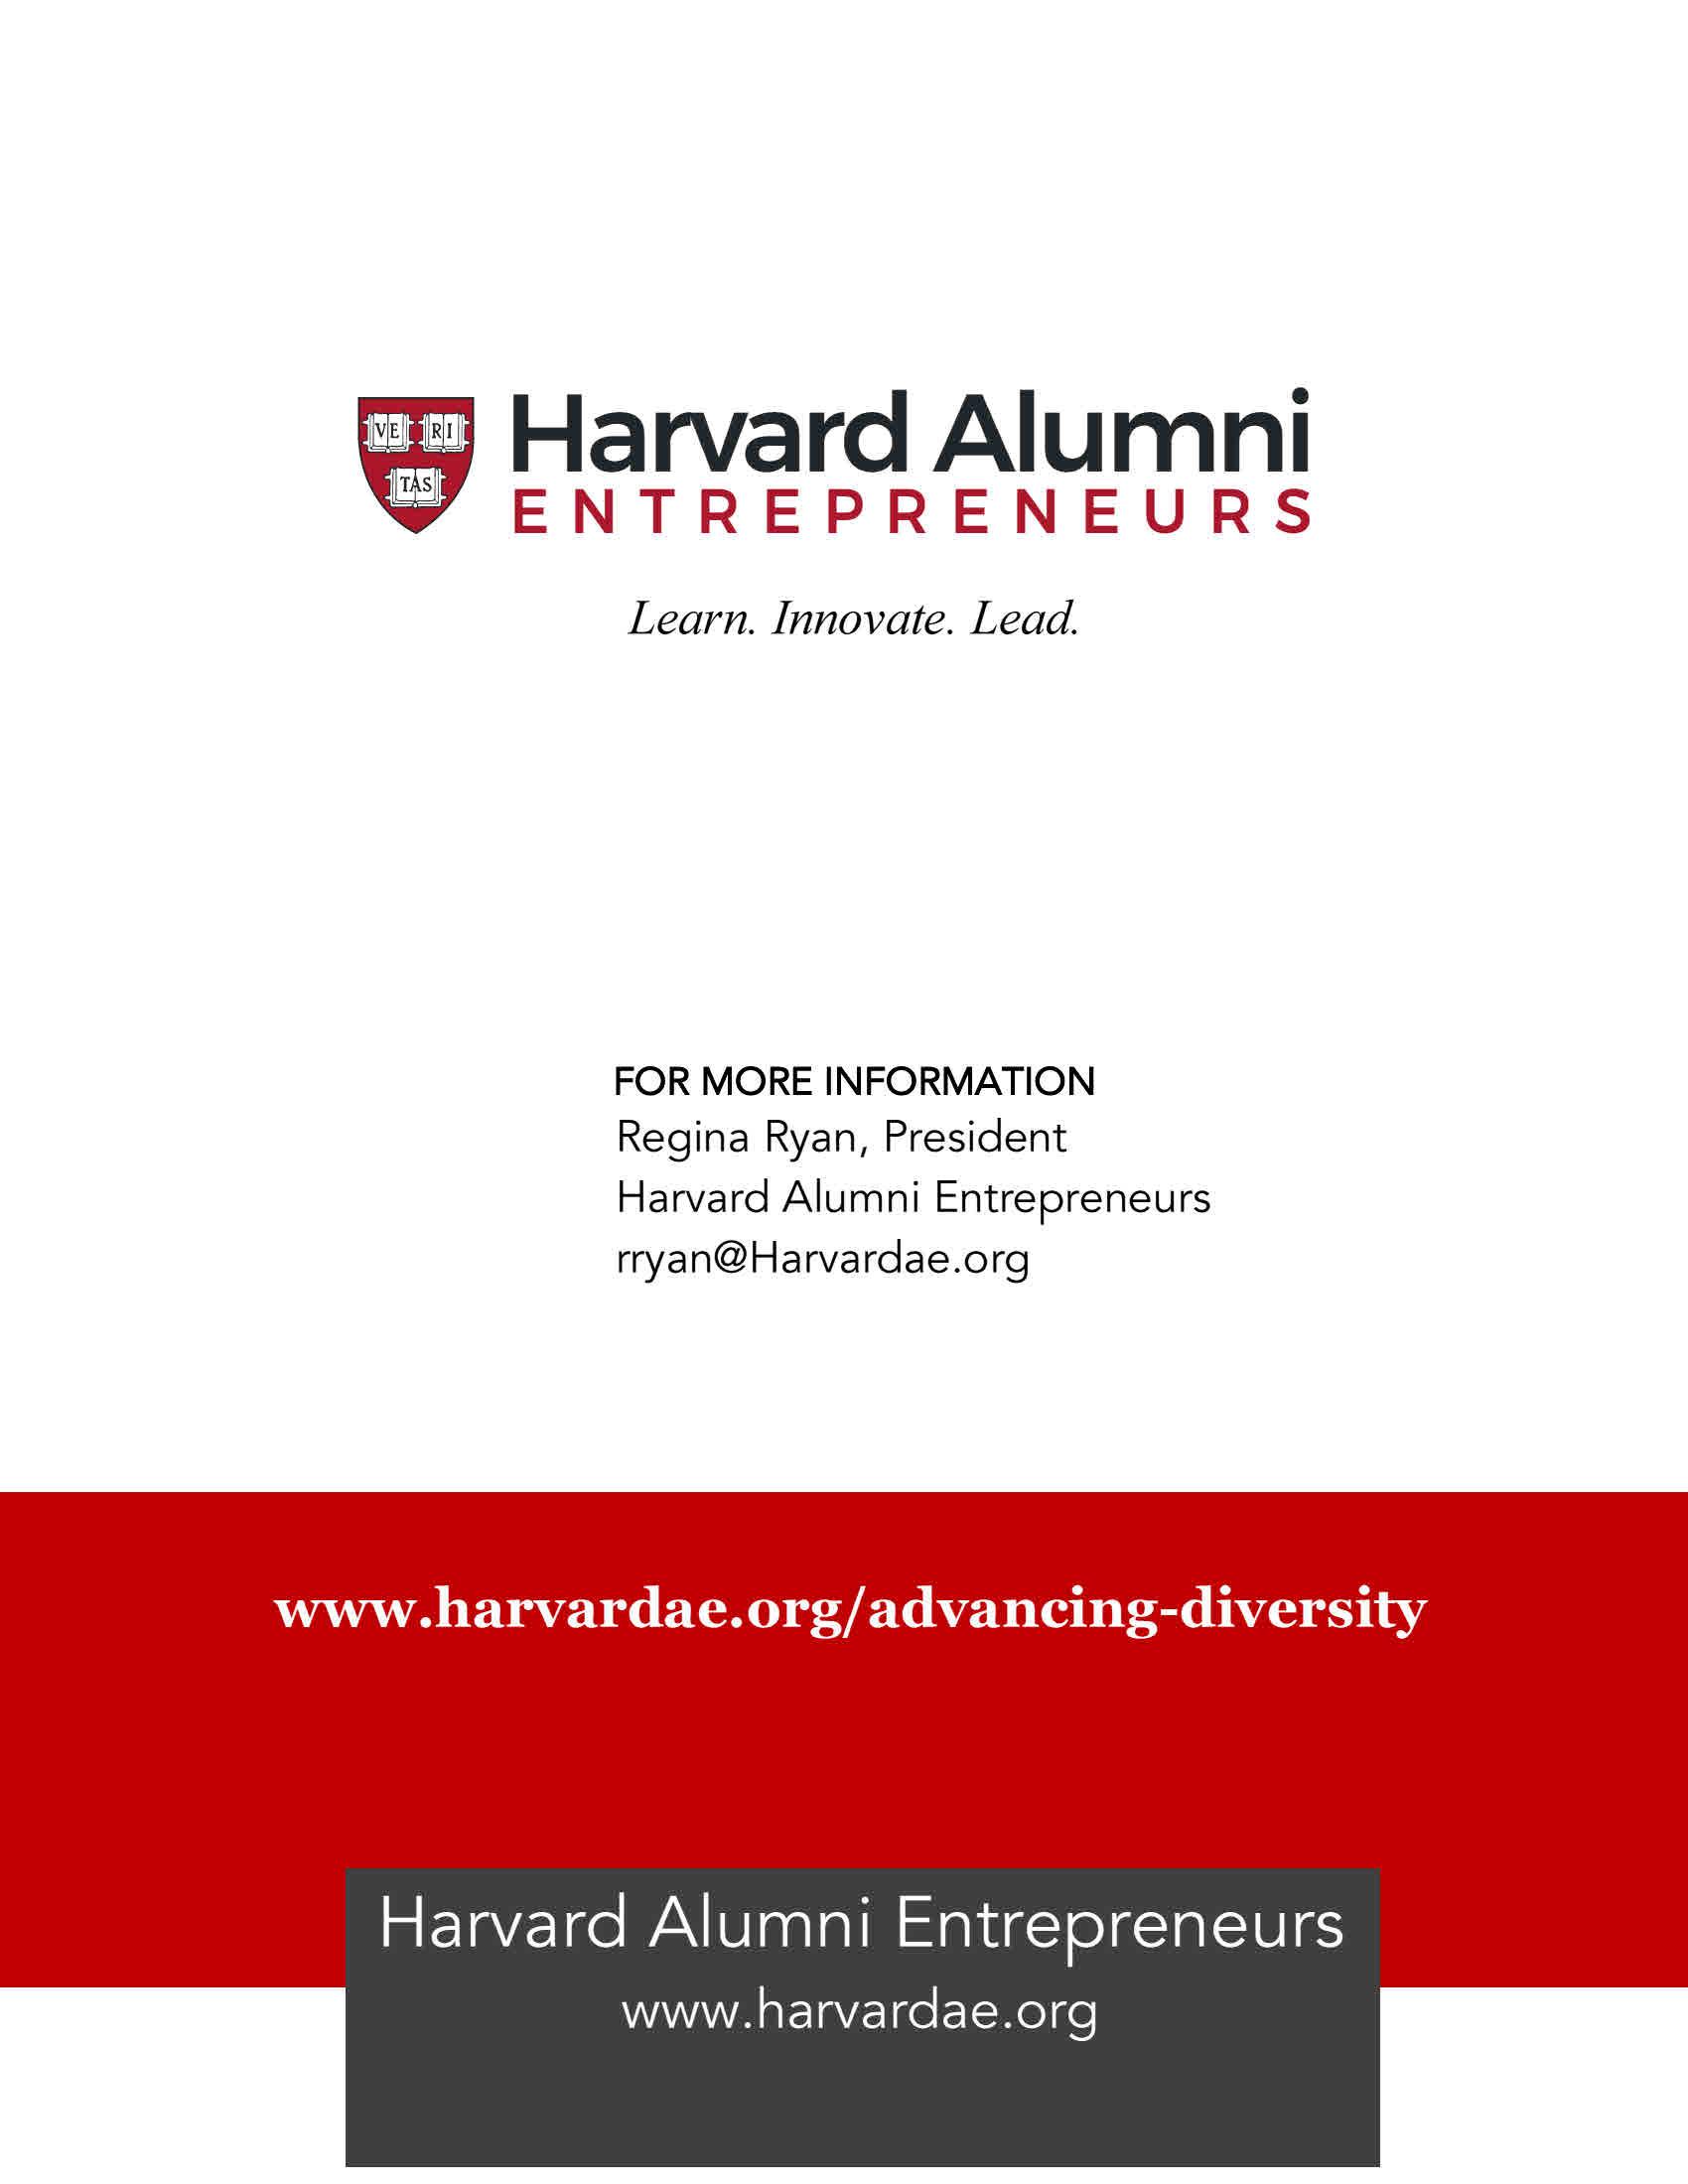 hae-advancing-diversity_overview_september-2020--5-